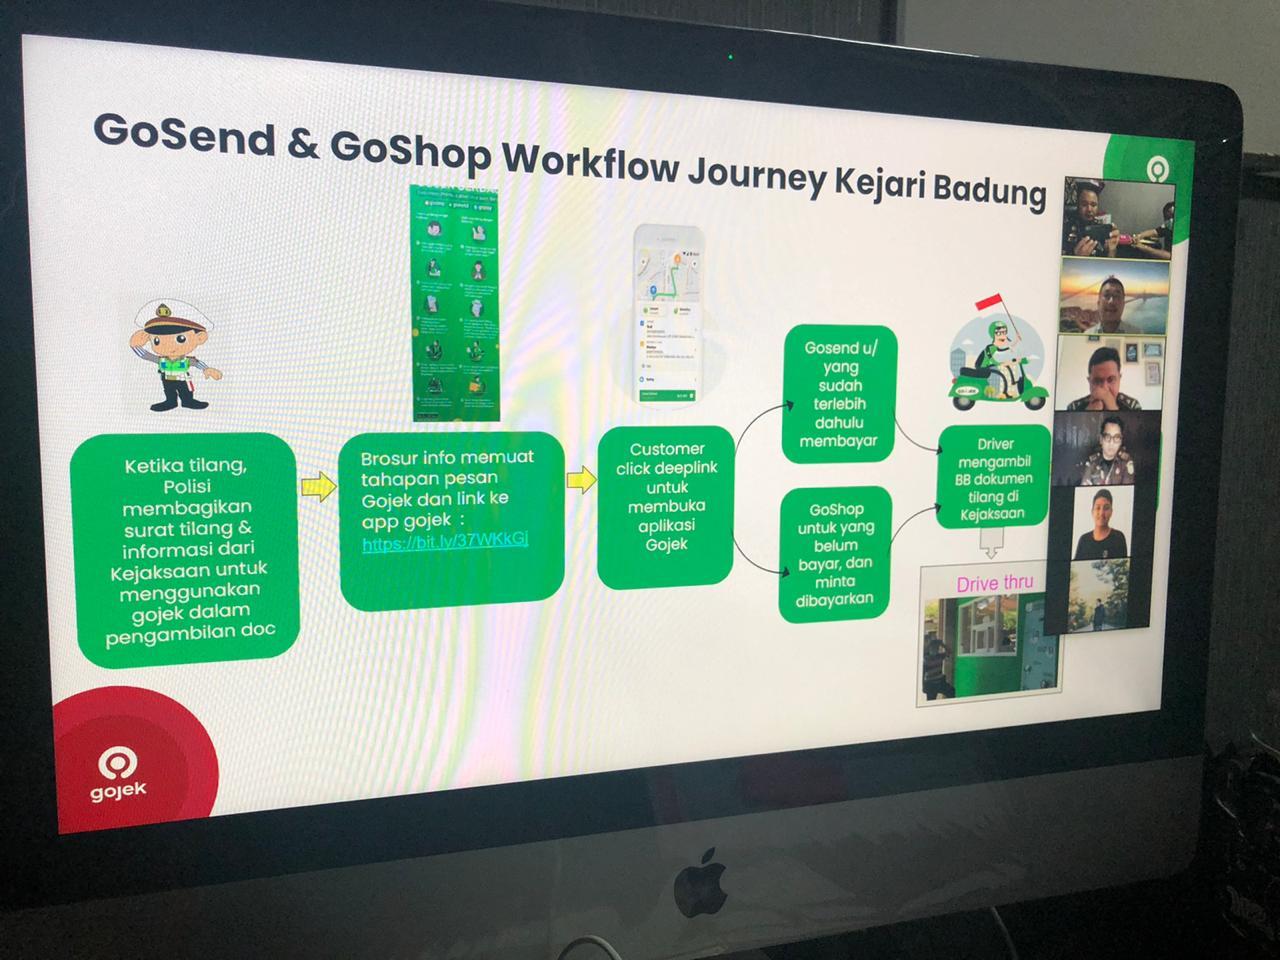 Kejari Badung bekerja sama dengan Pihak Gojek Denpasar untuk mempersiapkan sistem antar barang bukti dan tilang kepada masyarakat.